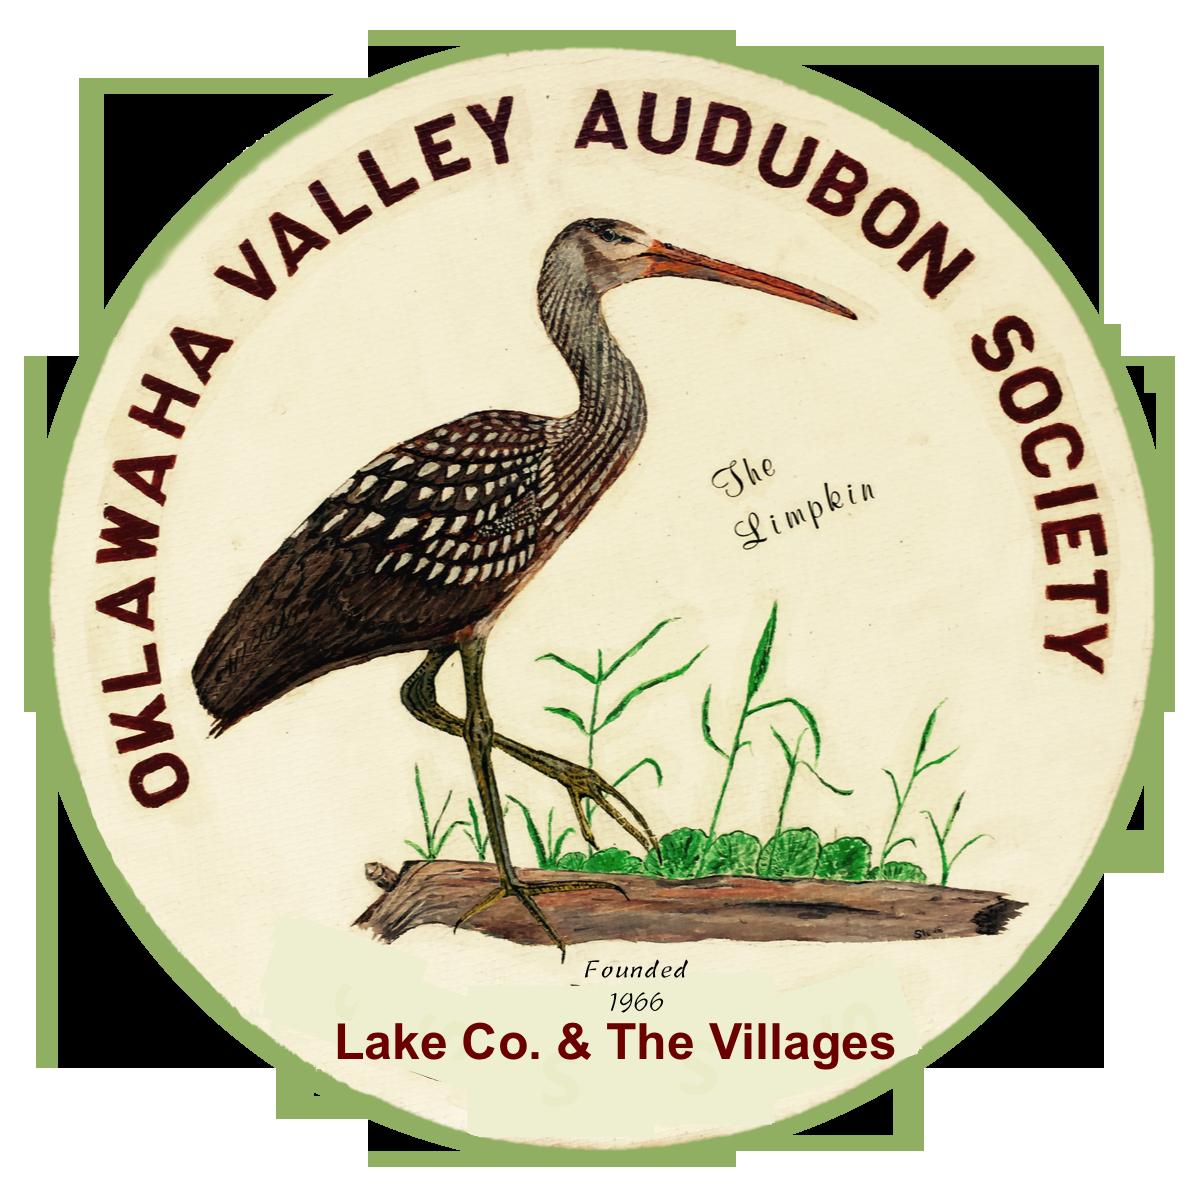 Co-sponsor. Oklawaha Valley Audubon Society